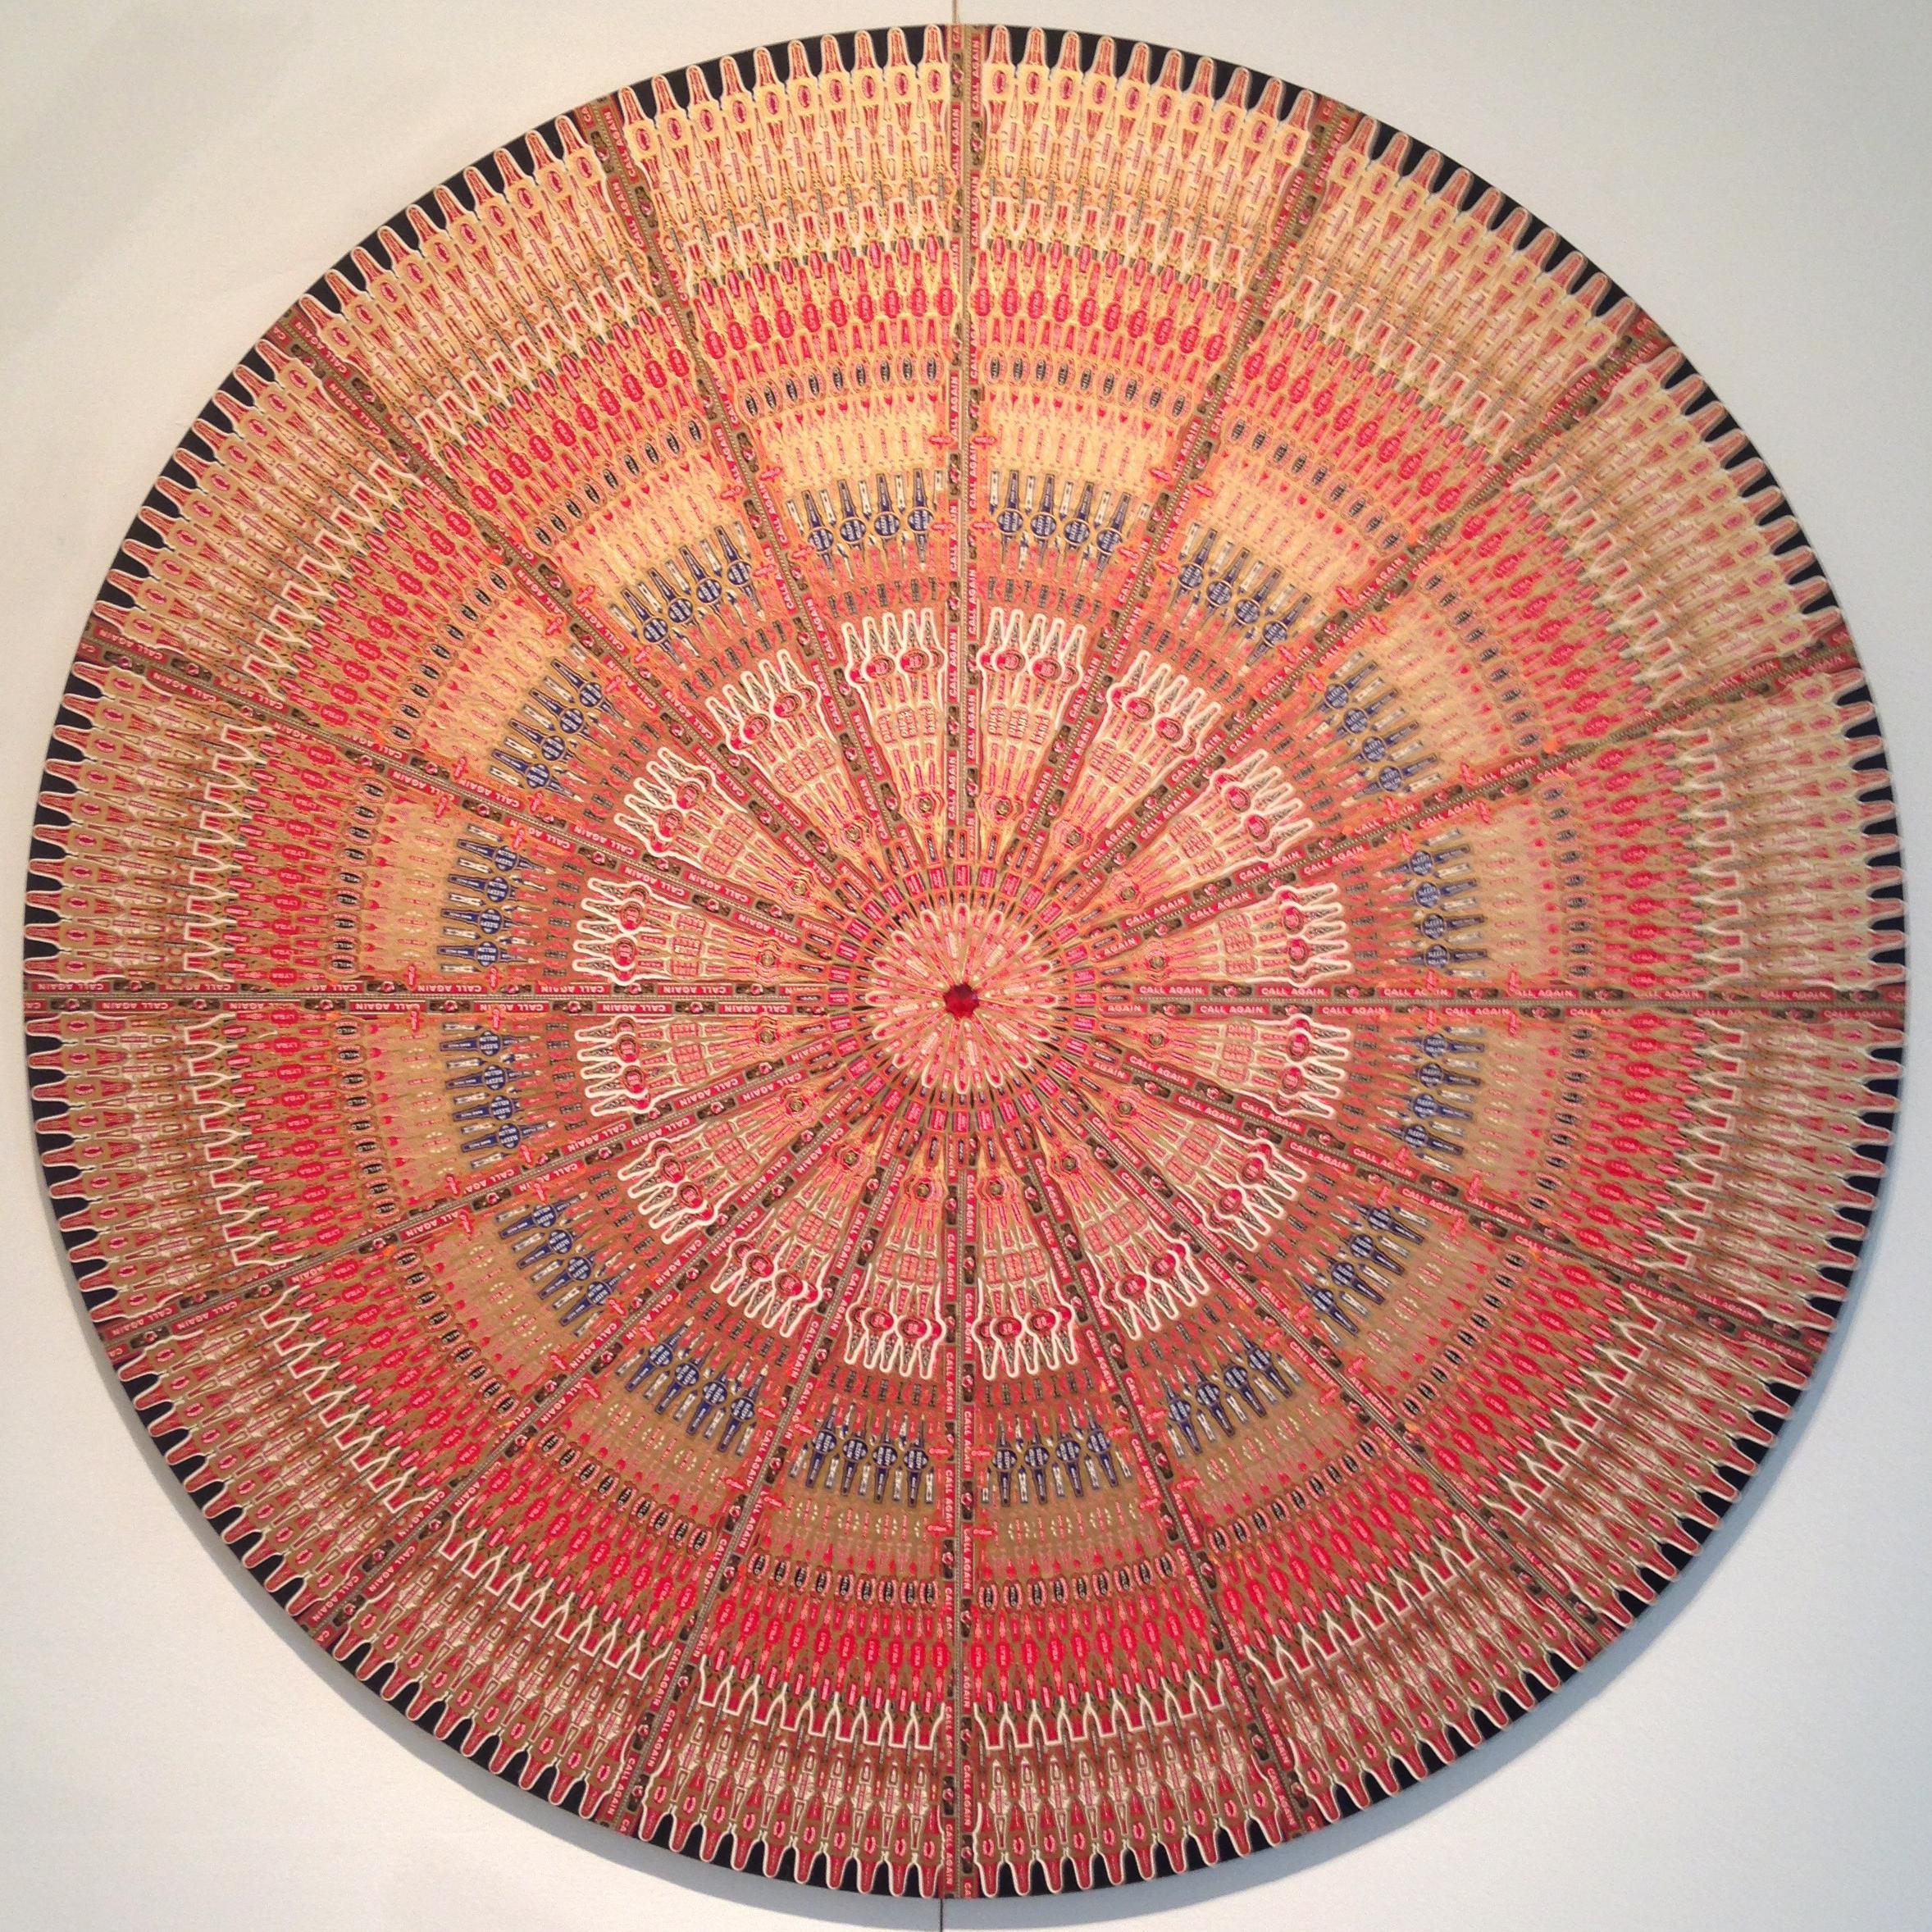 "48\"" diameter cigar band mandala on 3/4\"" birch base. Vintage paper cigar bands."